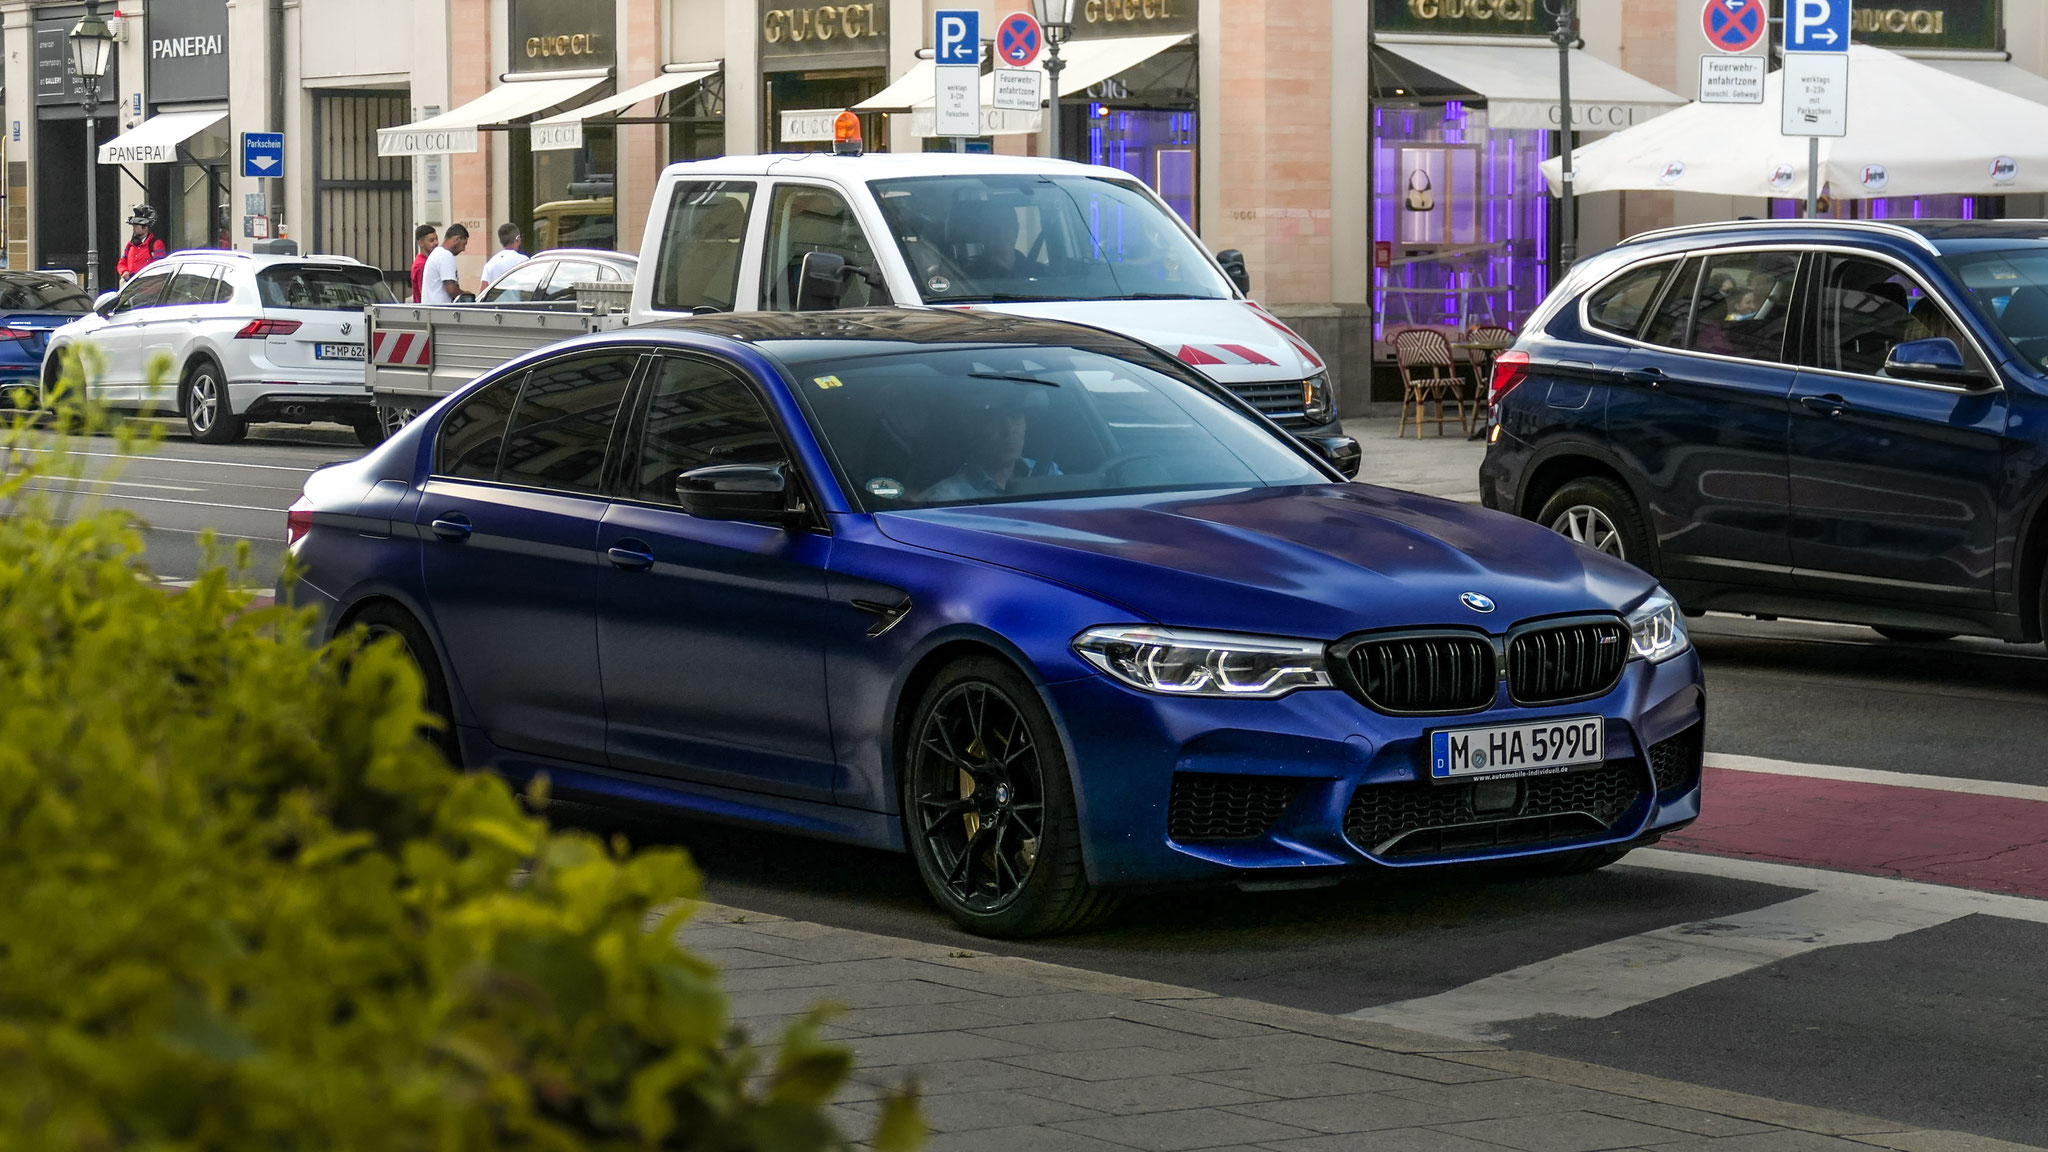 BMW M5 - M-HA-5990